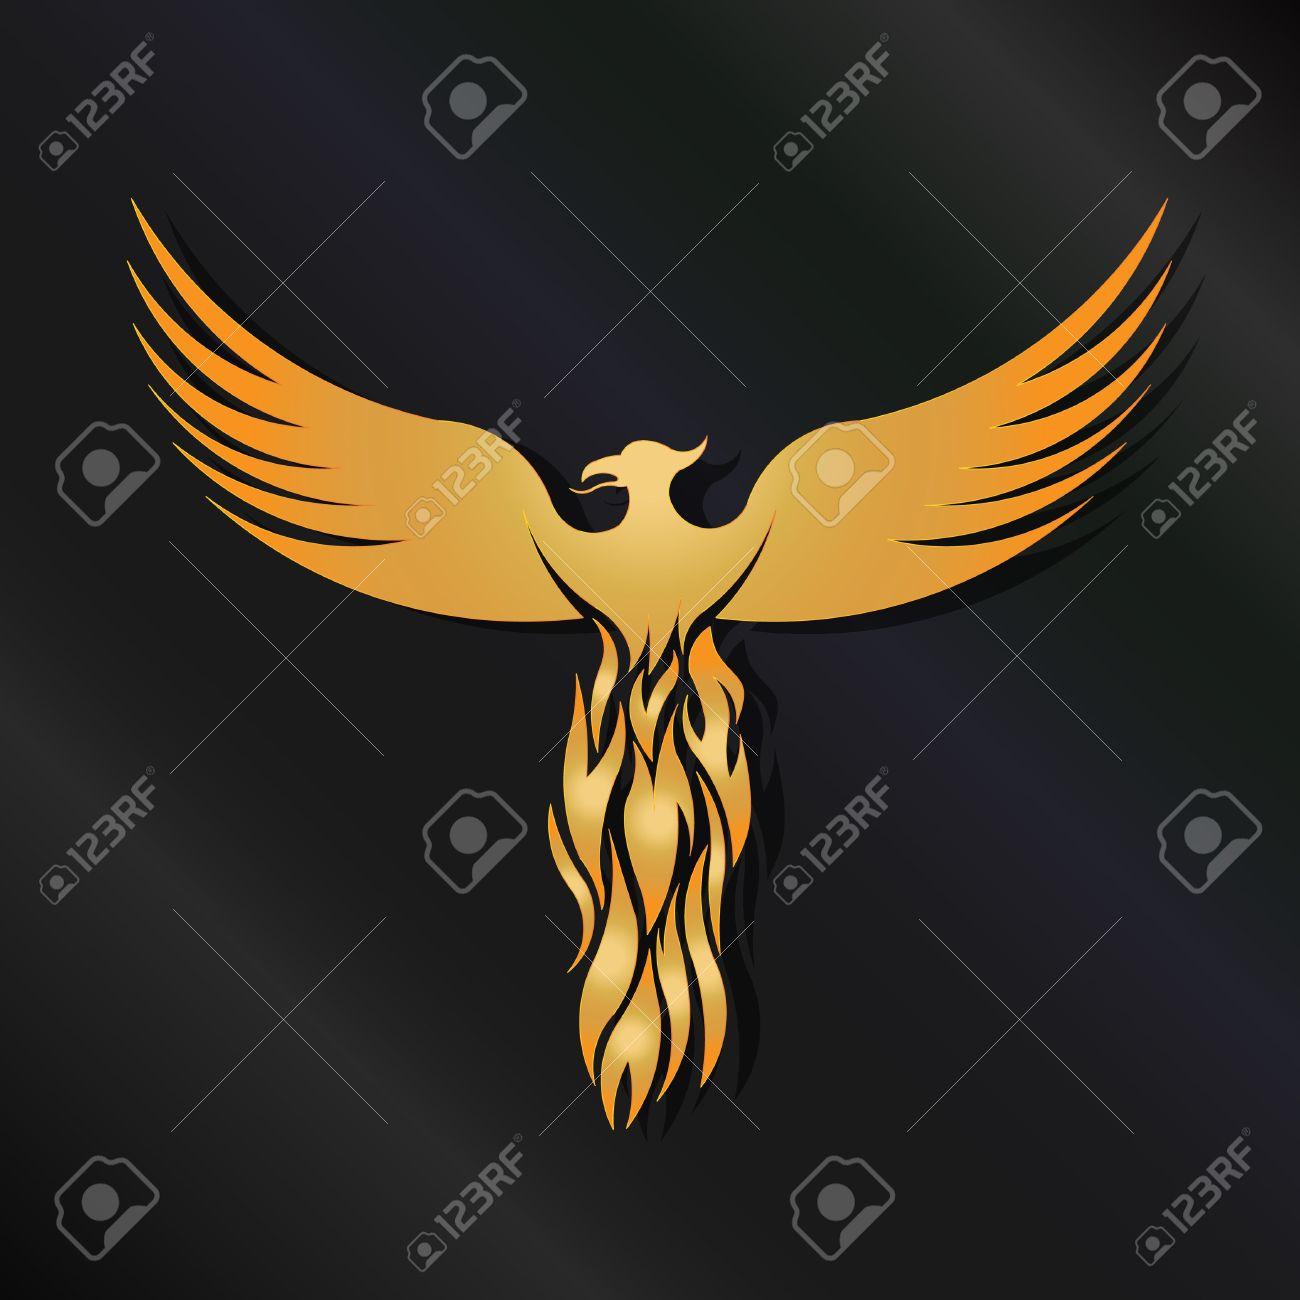 golden phoenix bird royalty free cliparts vectors and stock